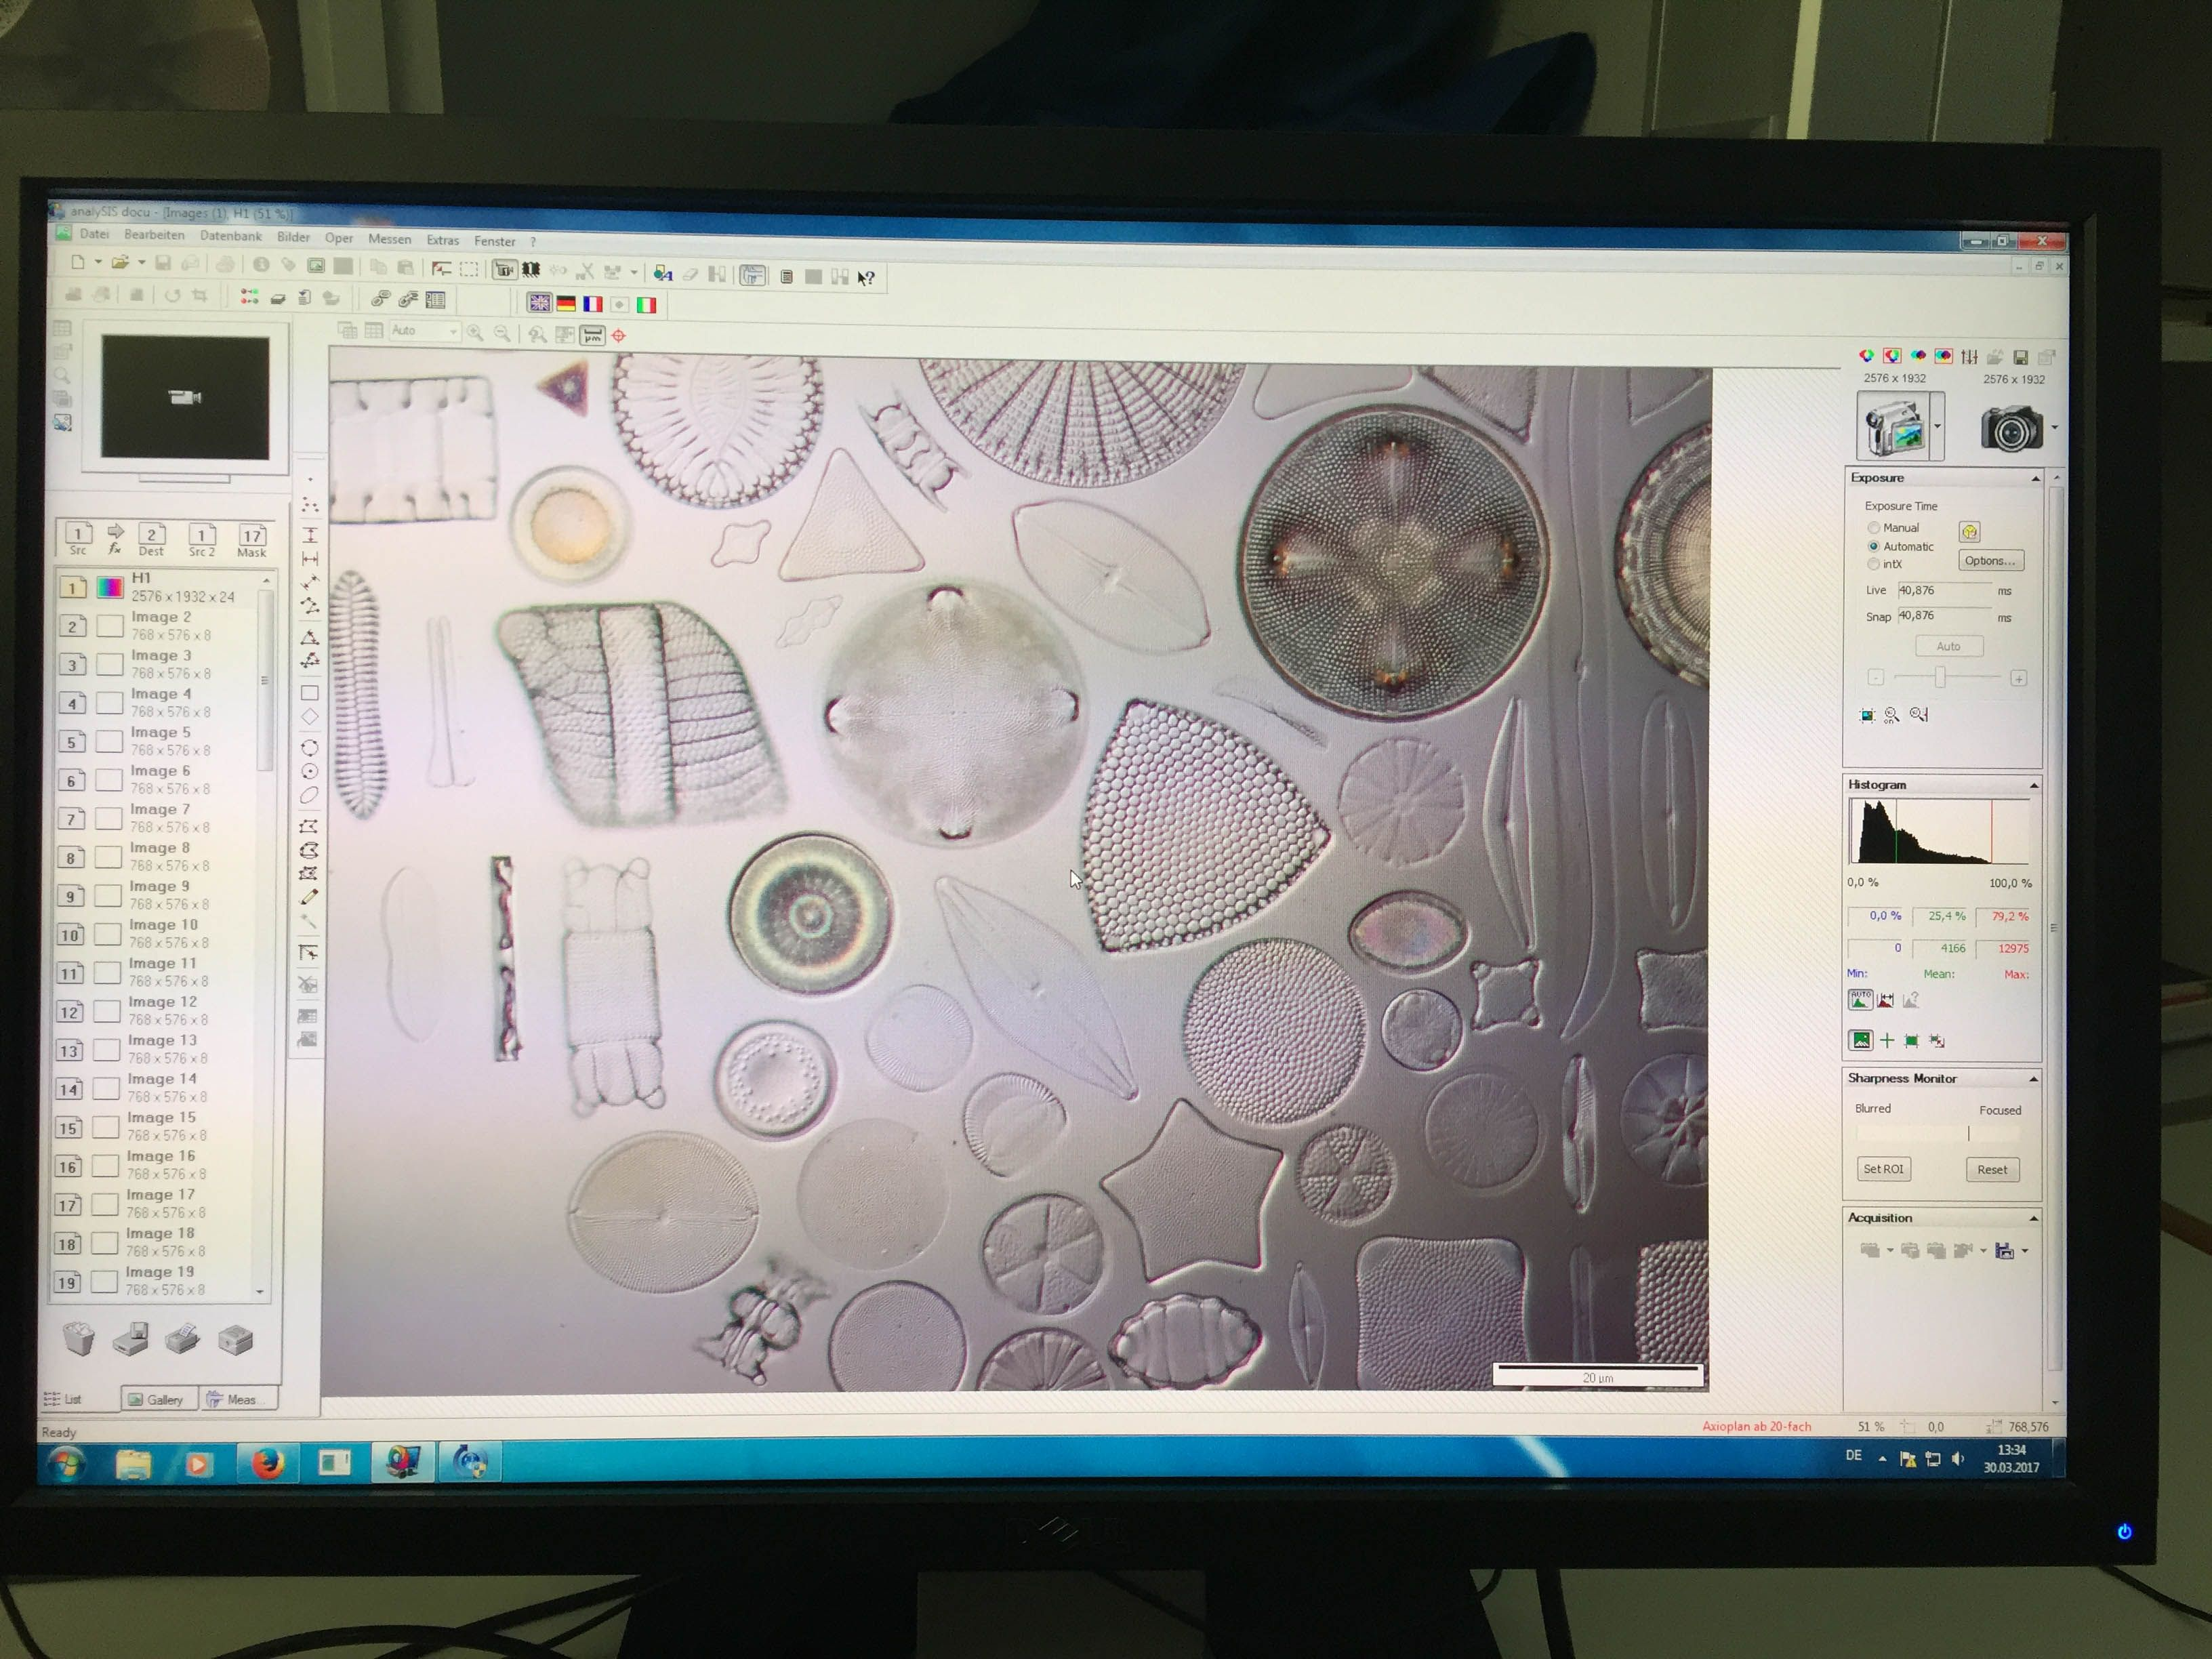 diatoms under the microscope